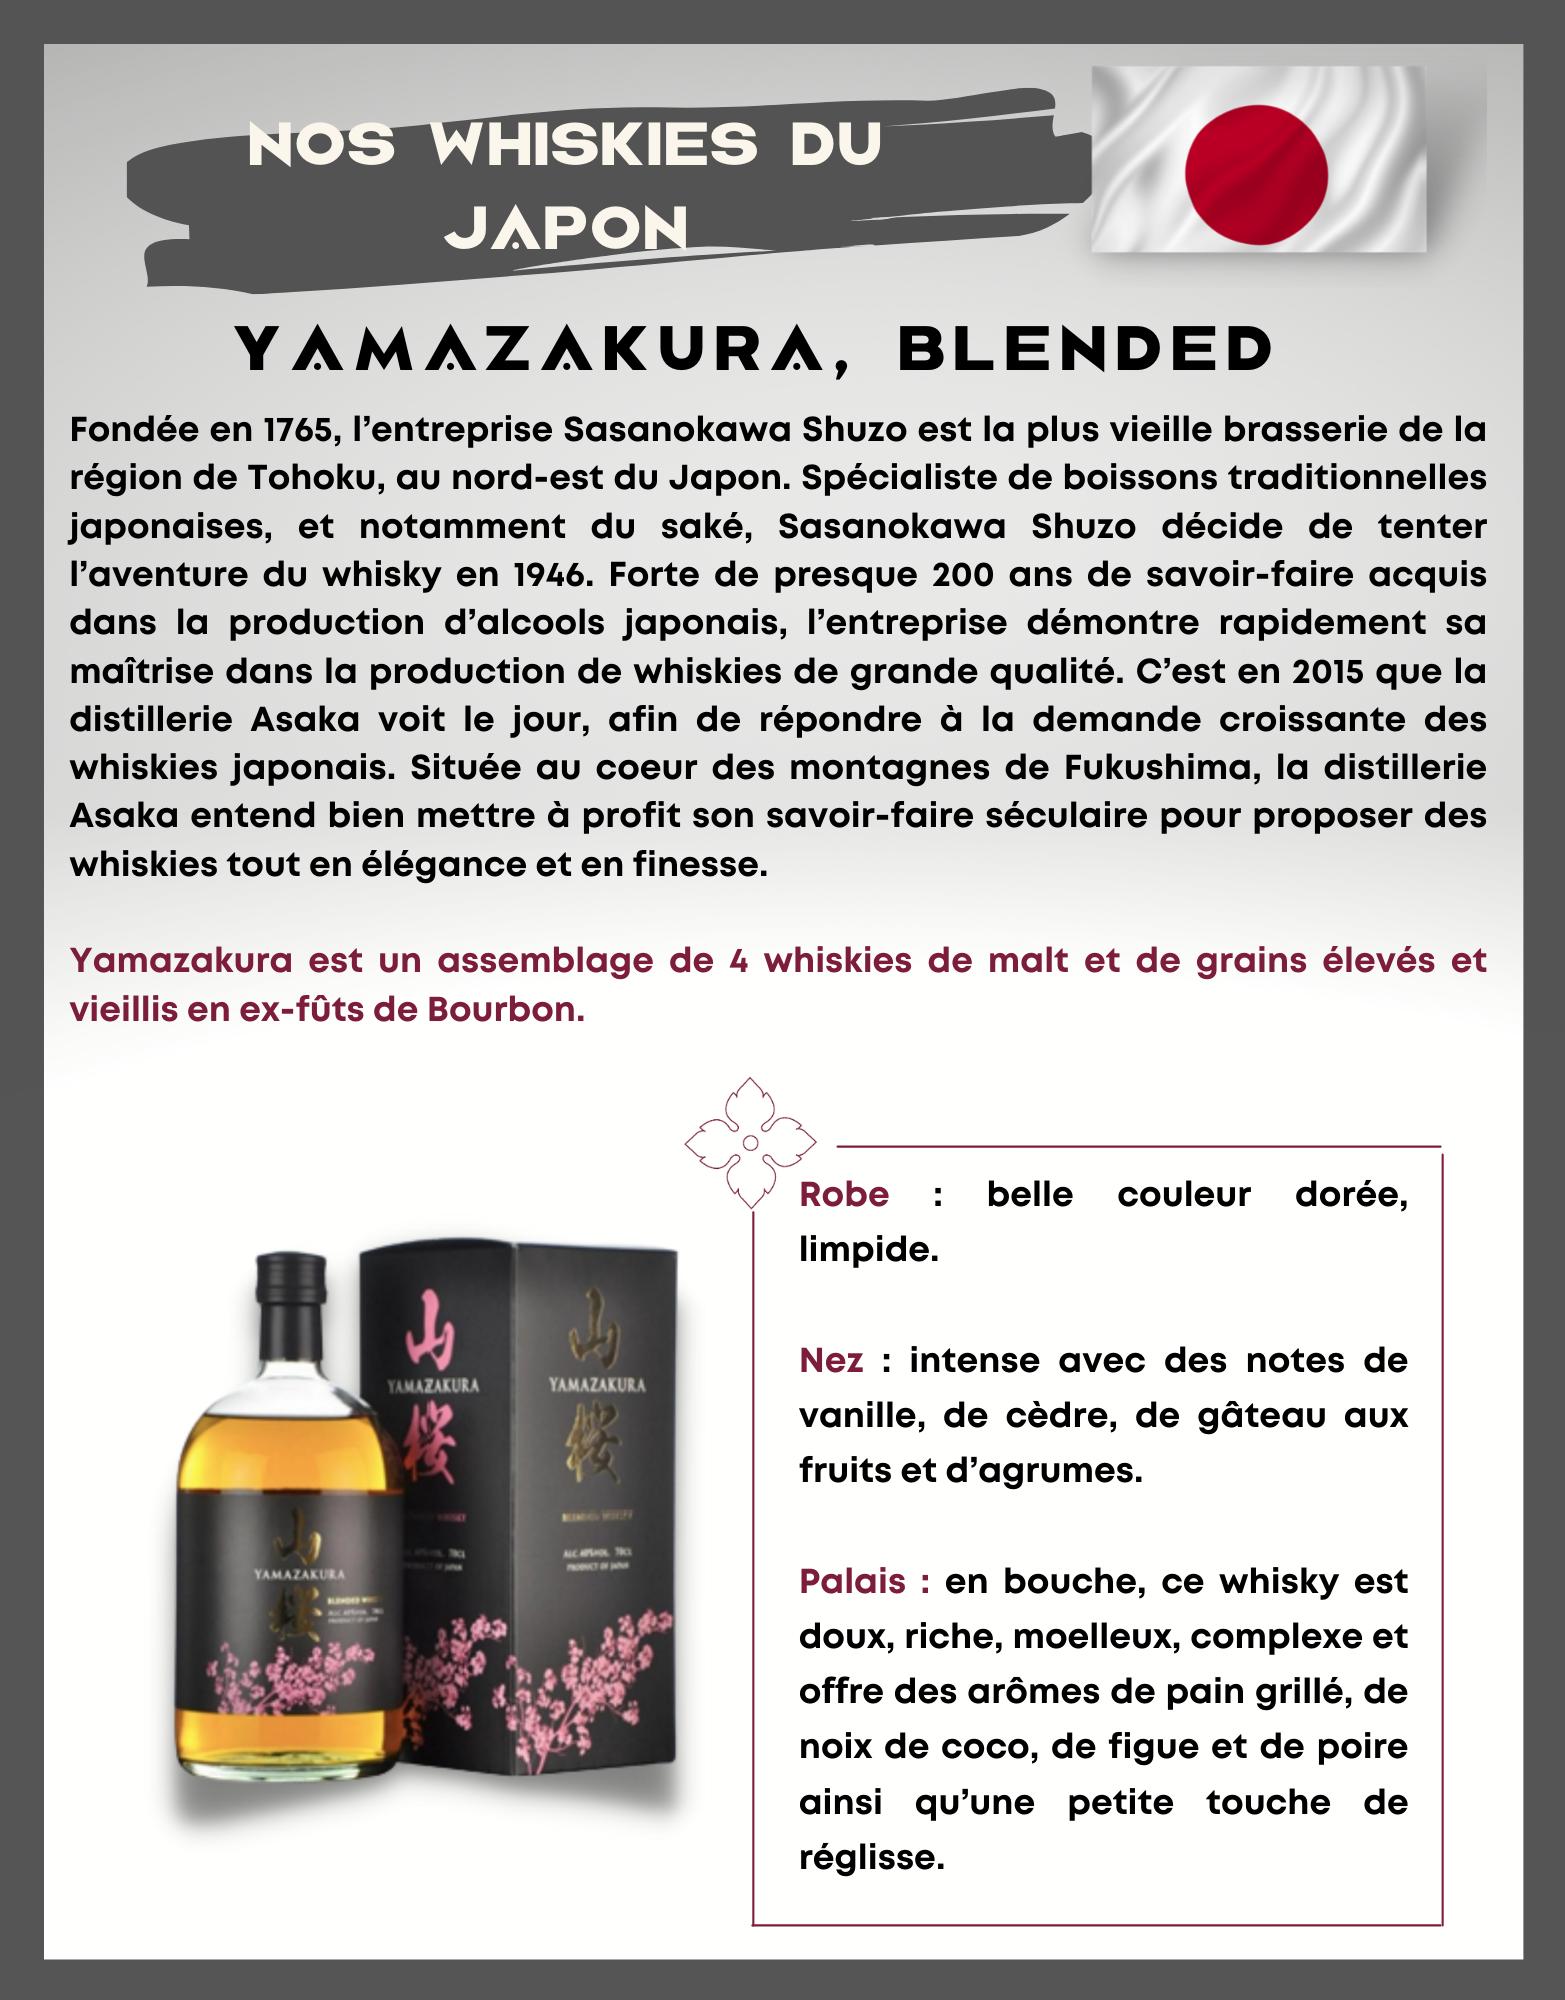 YAMAZAKURA, Blended